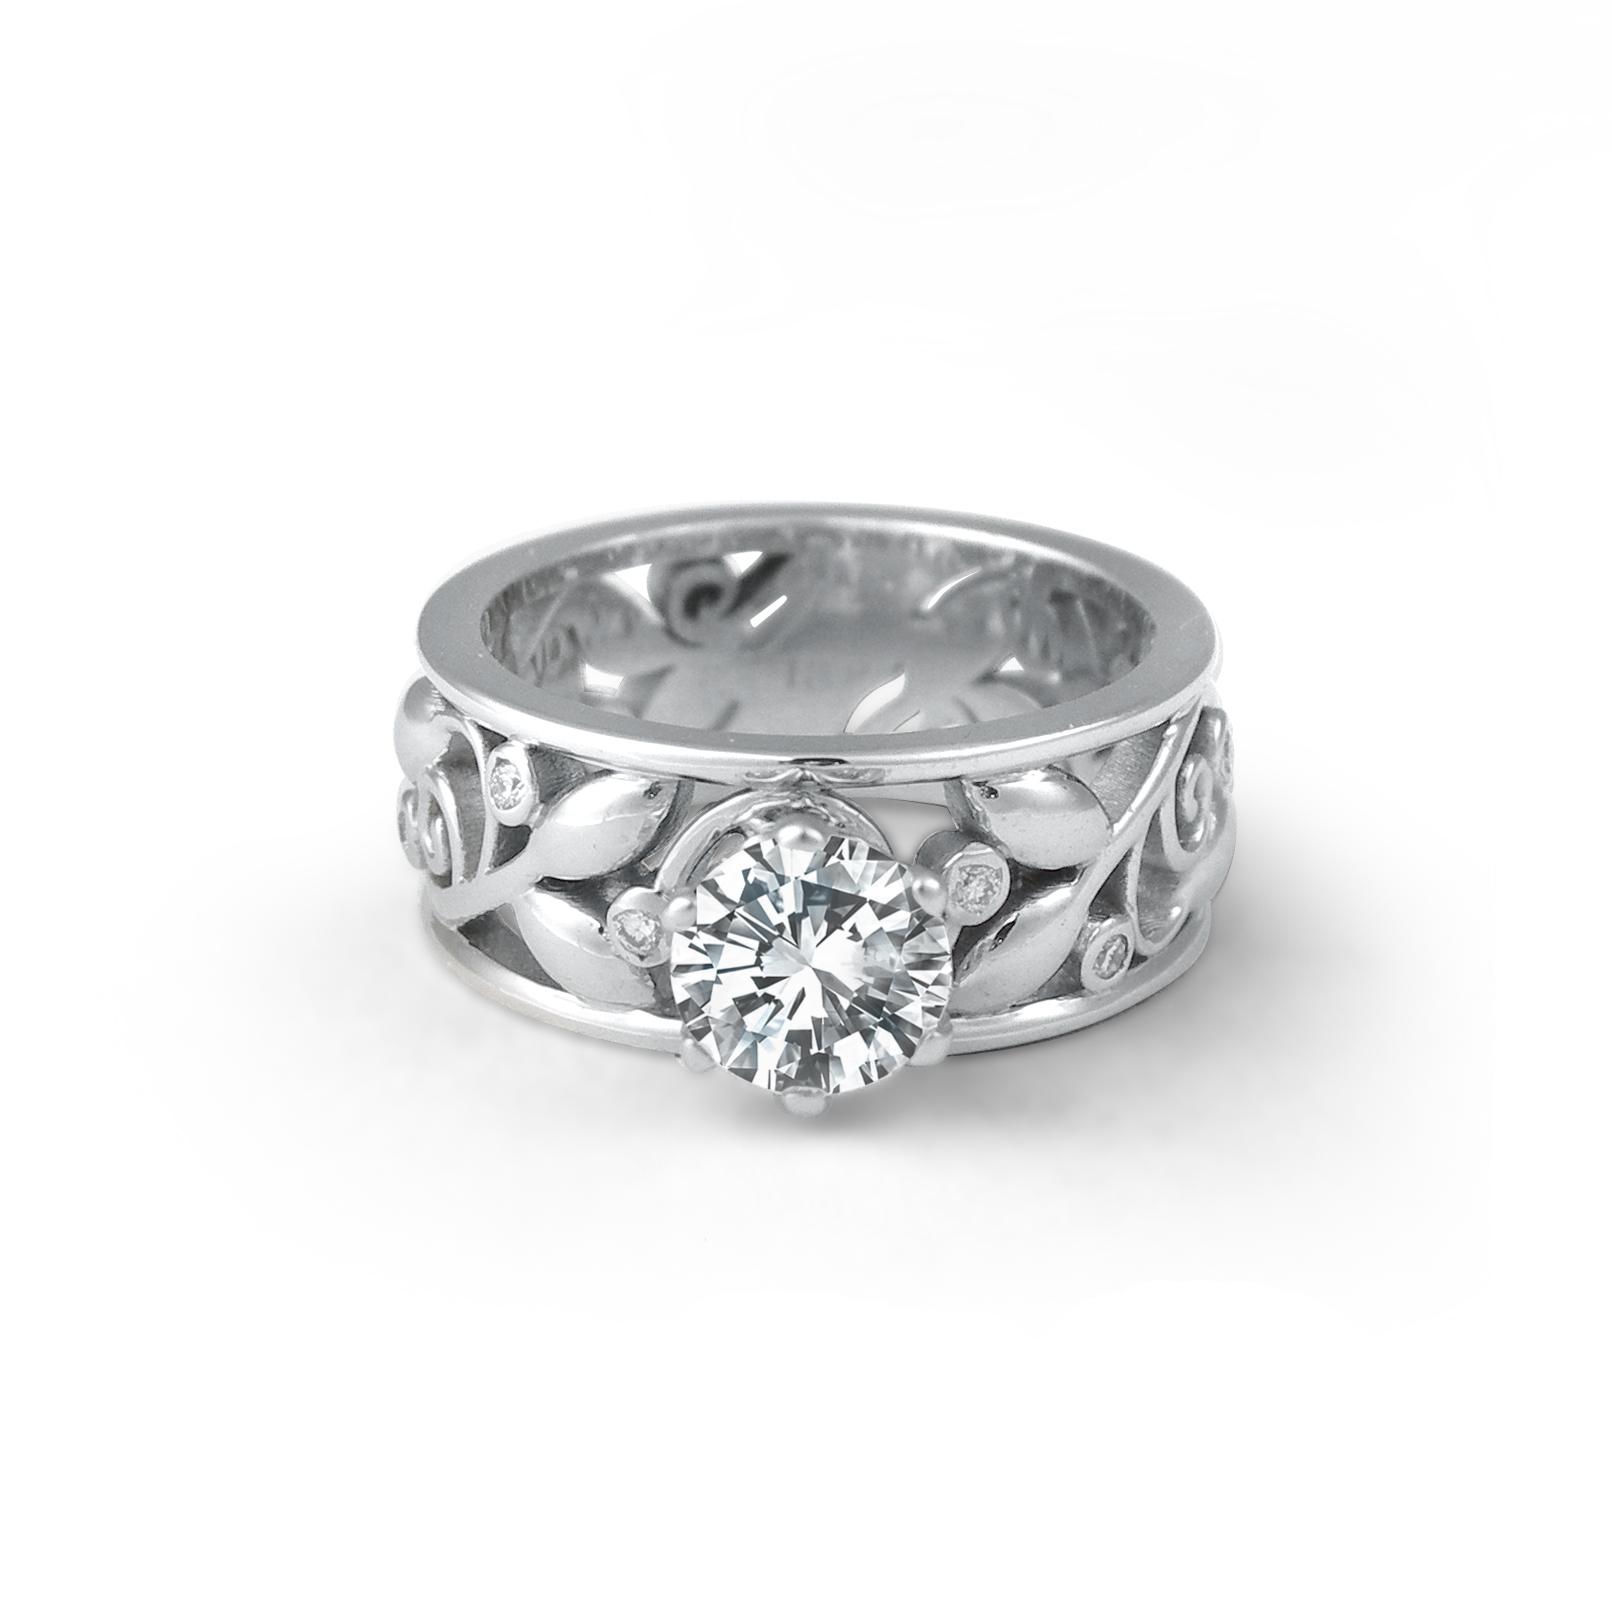 Wide Leaf and Vine Engagement Ring.jpg